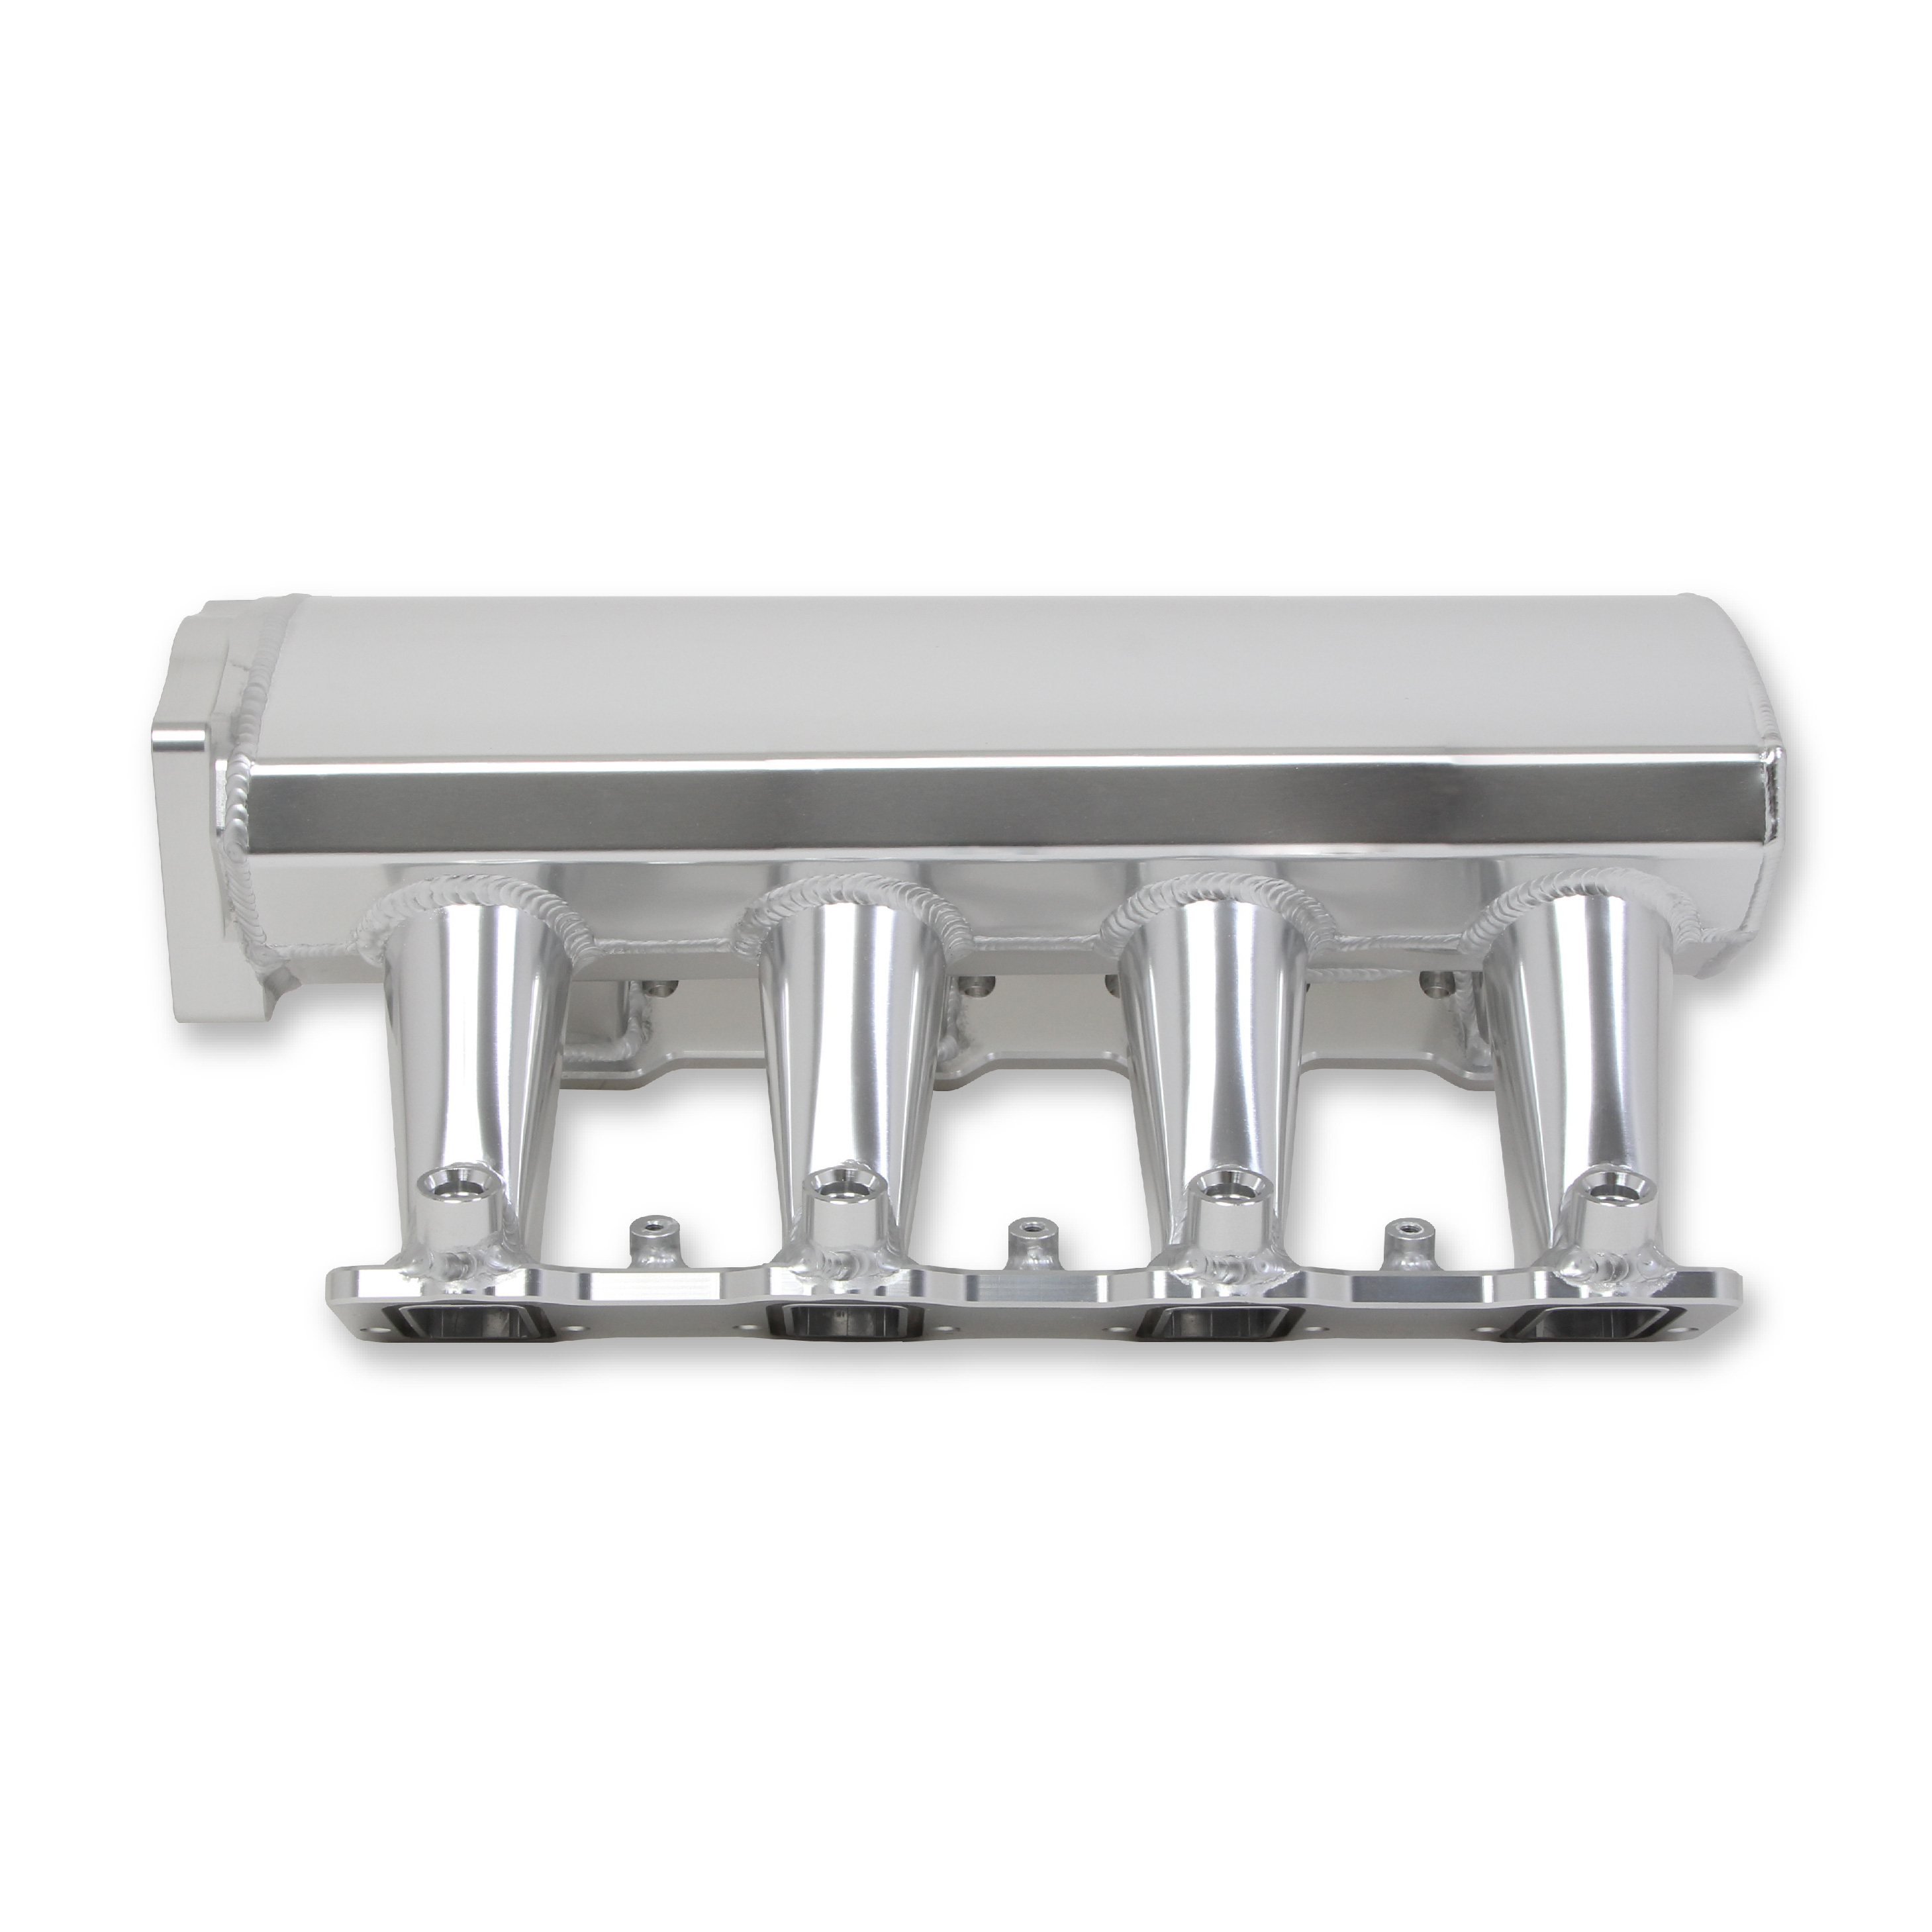 RPC LS3/L92 102mm Fabricated Intake Manifold